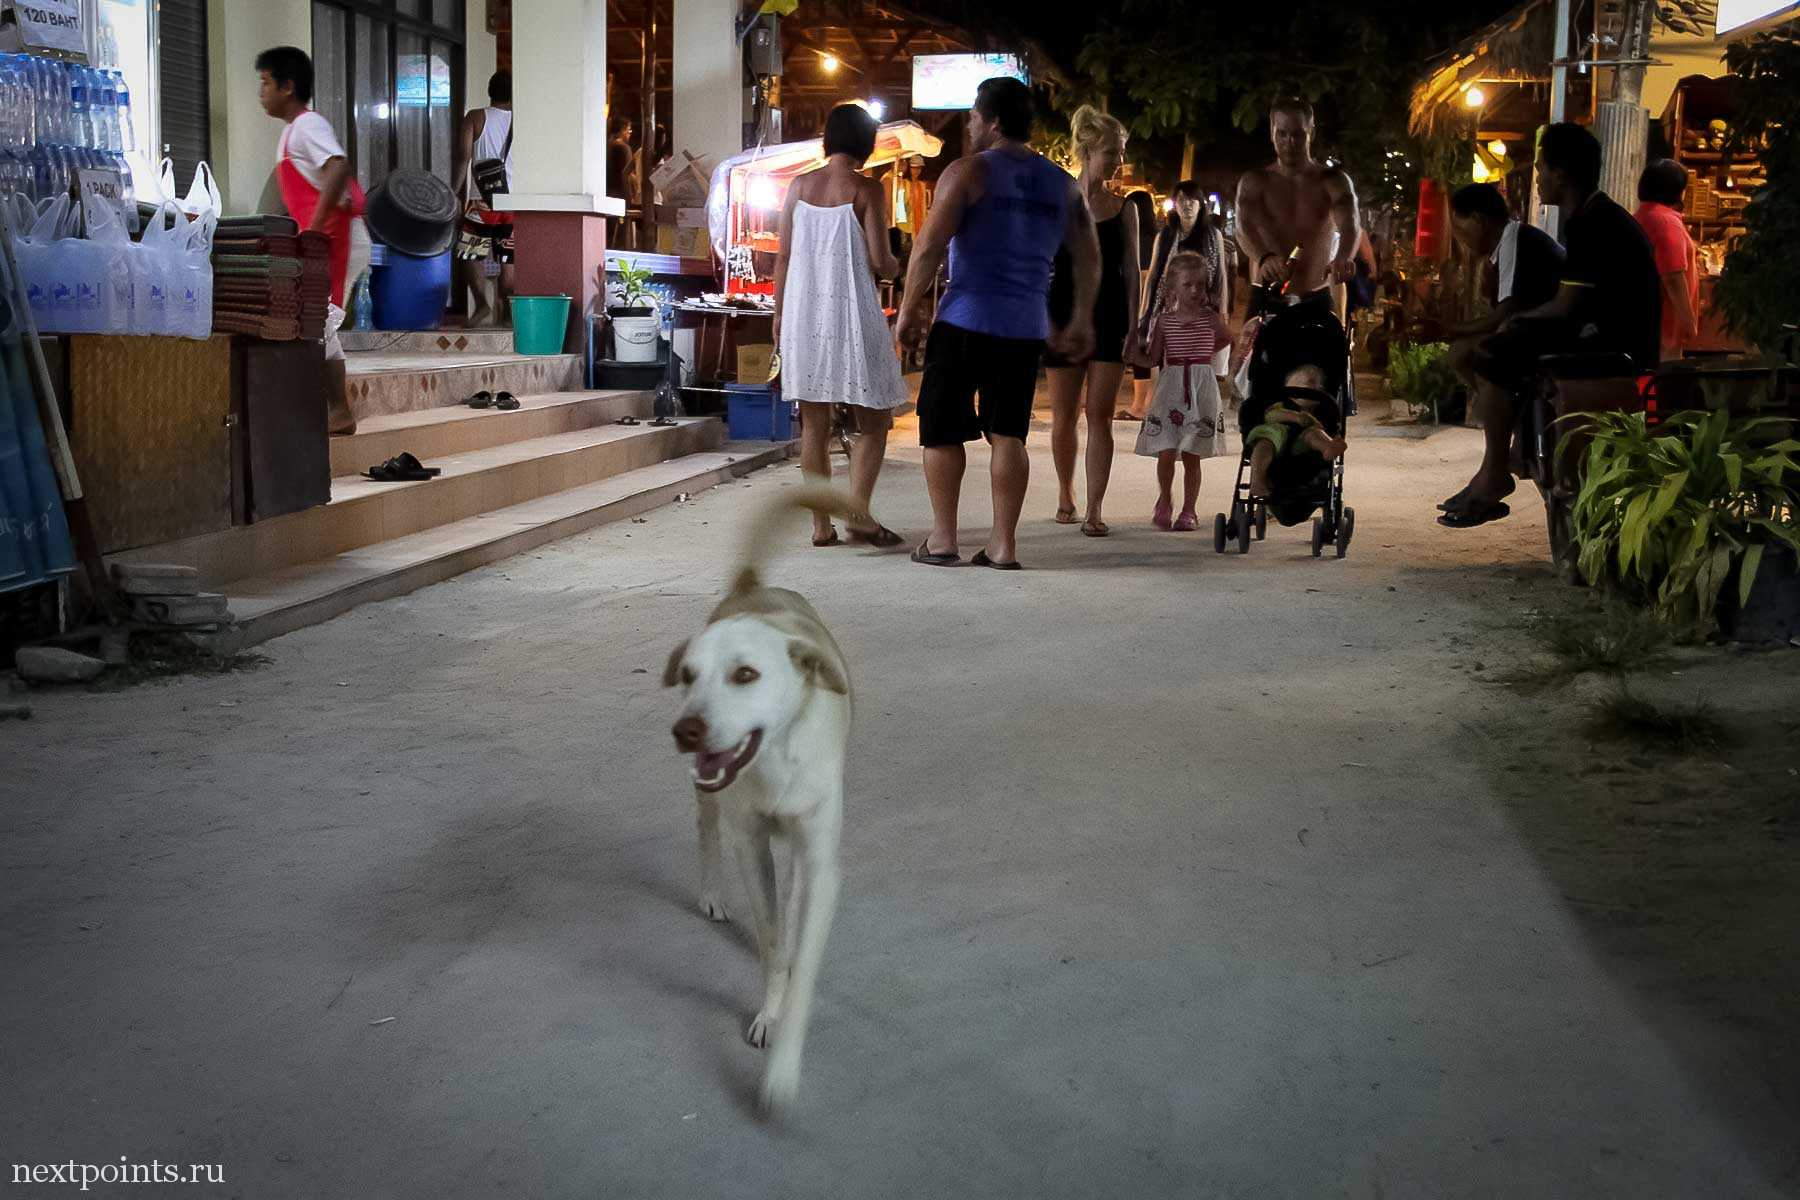 Вечерний променад жителей острова Ко Липе